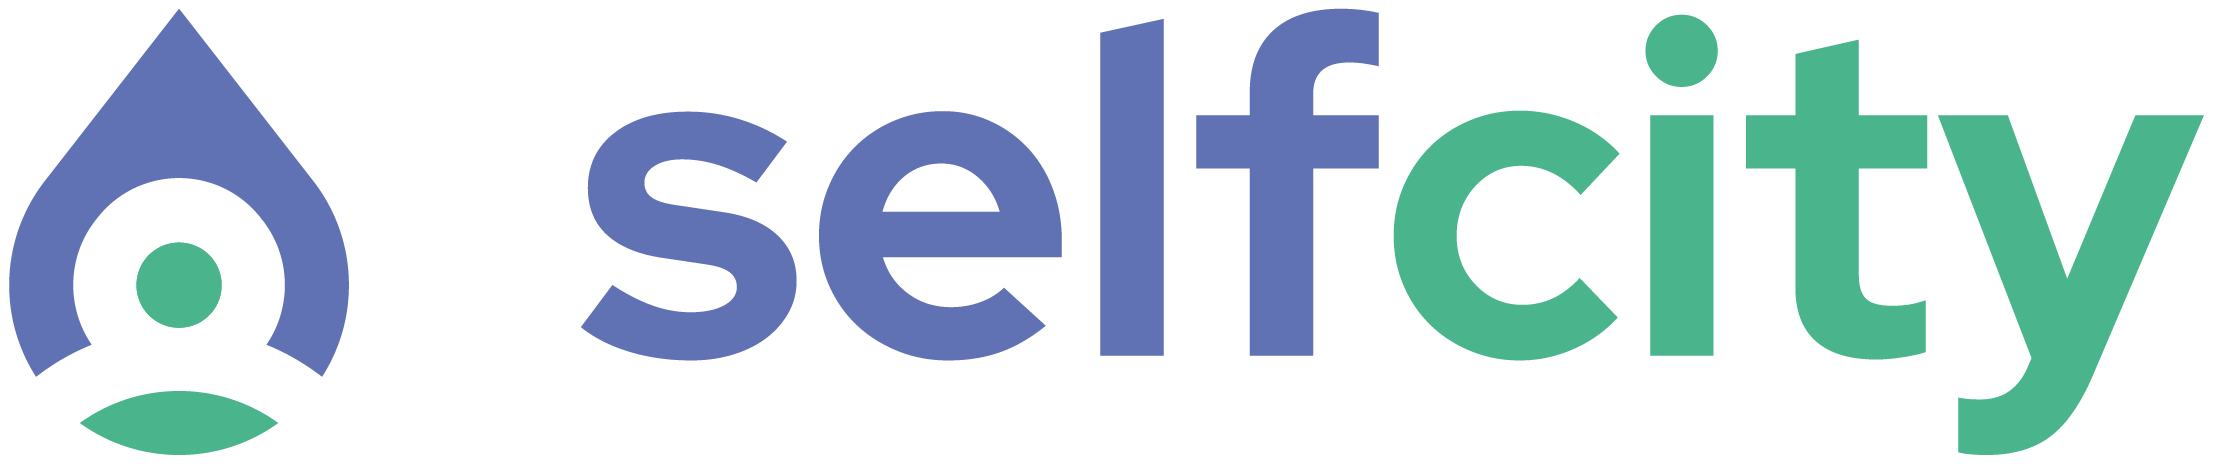 Selfcity